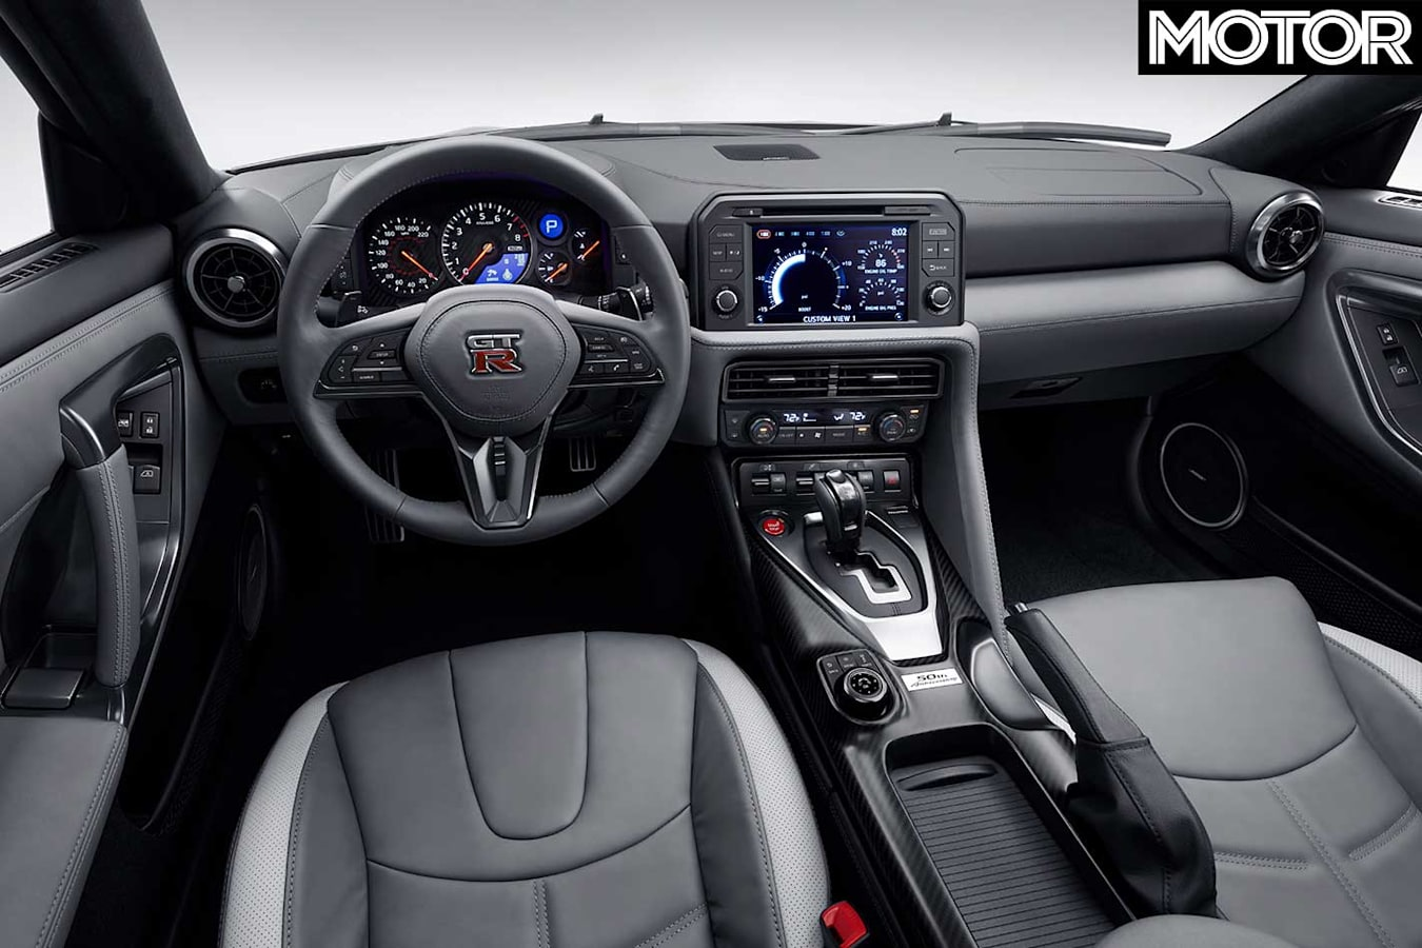 2020 Nissan GT R 50th Anniversary Edition Interior Jpg